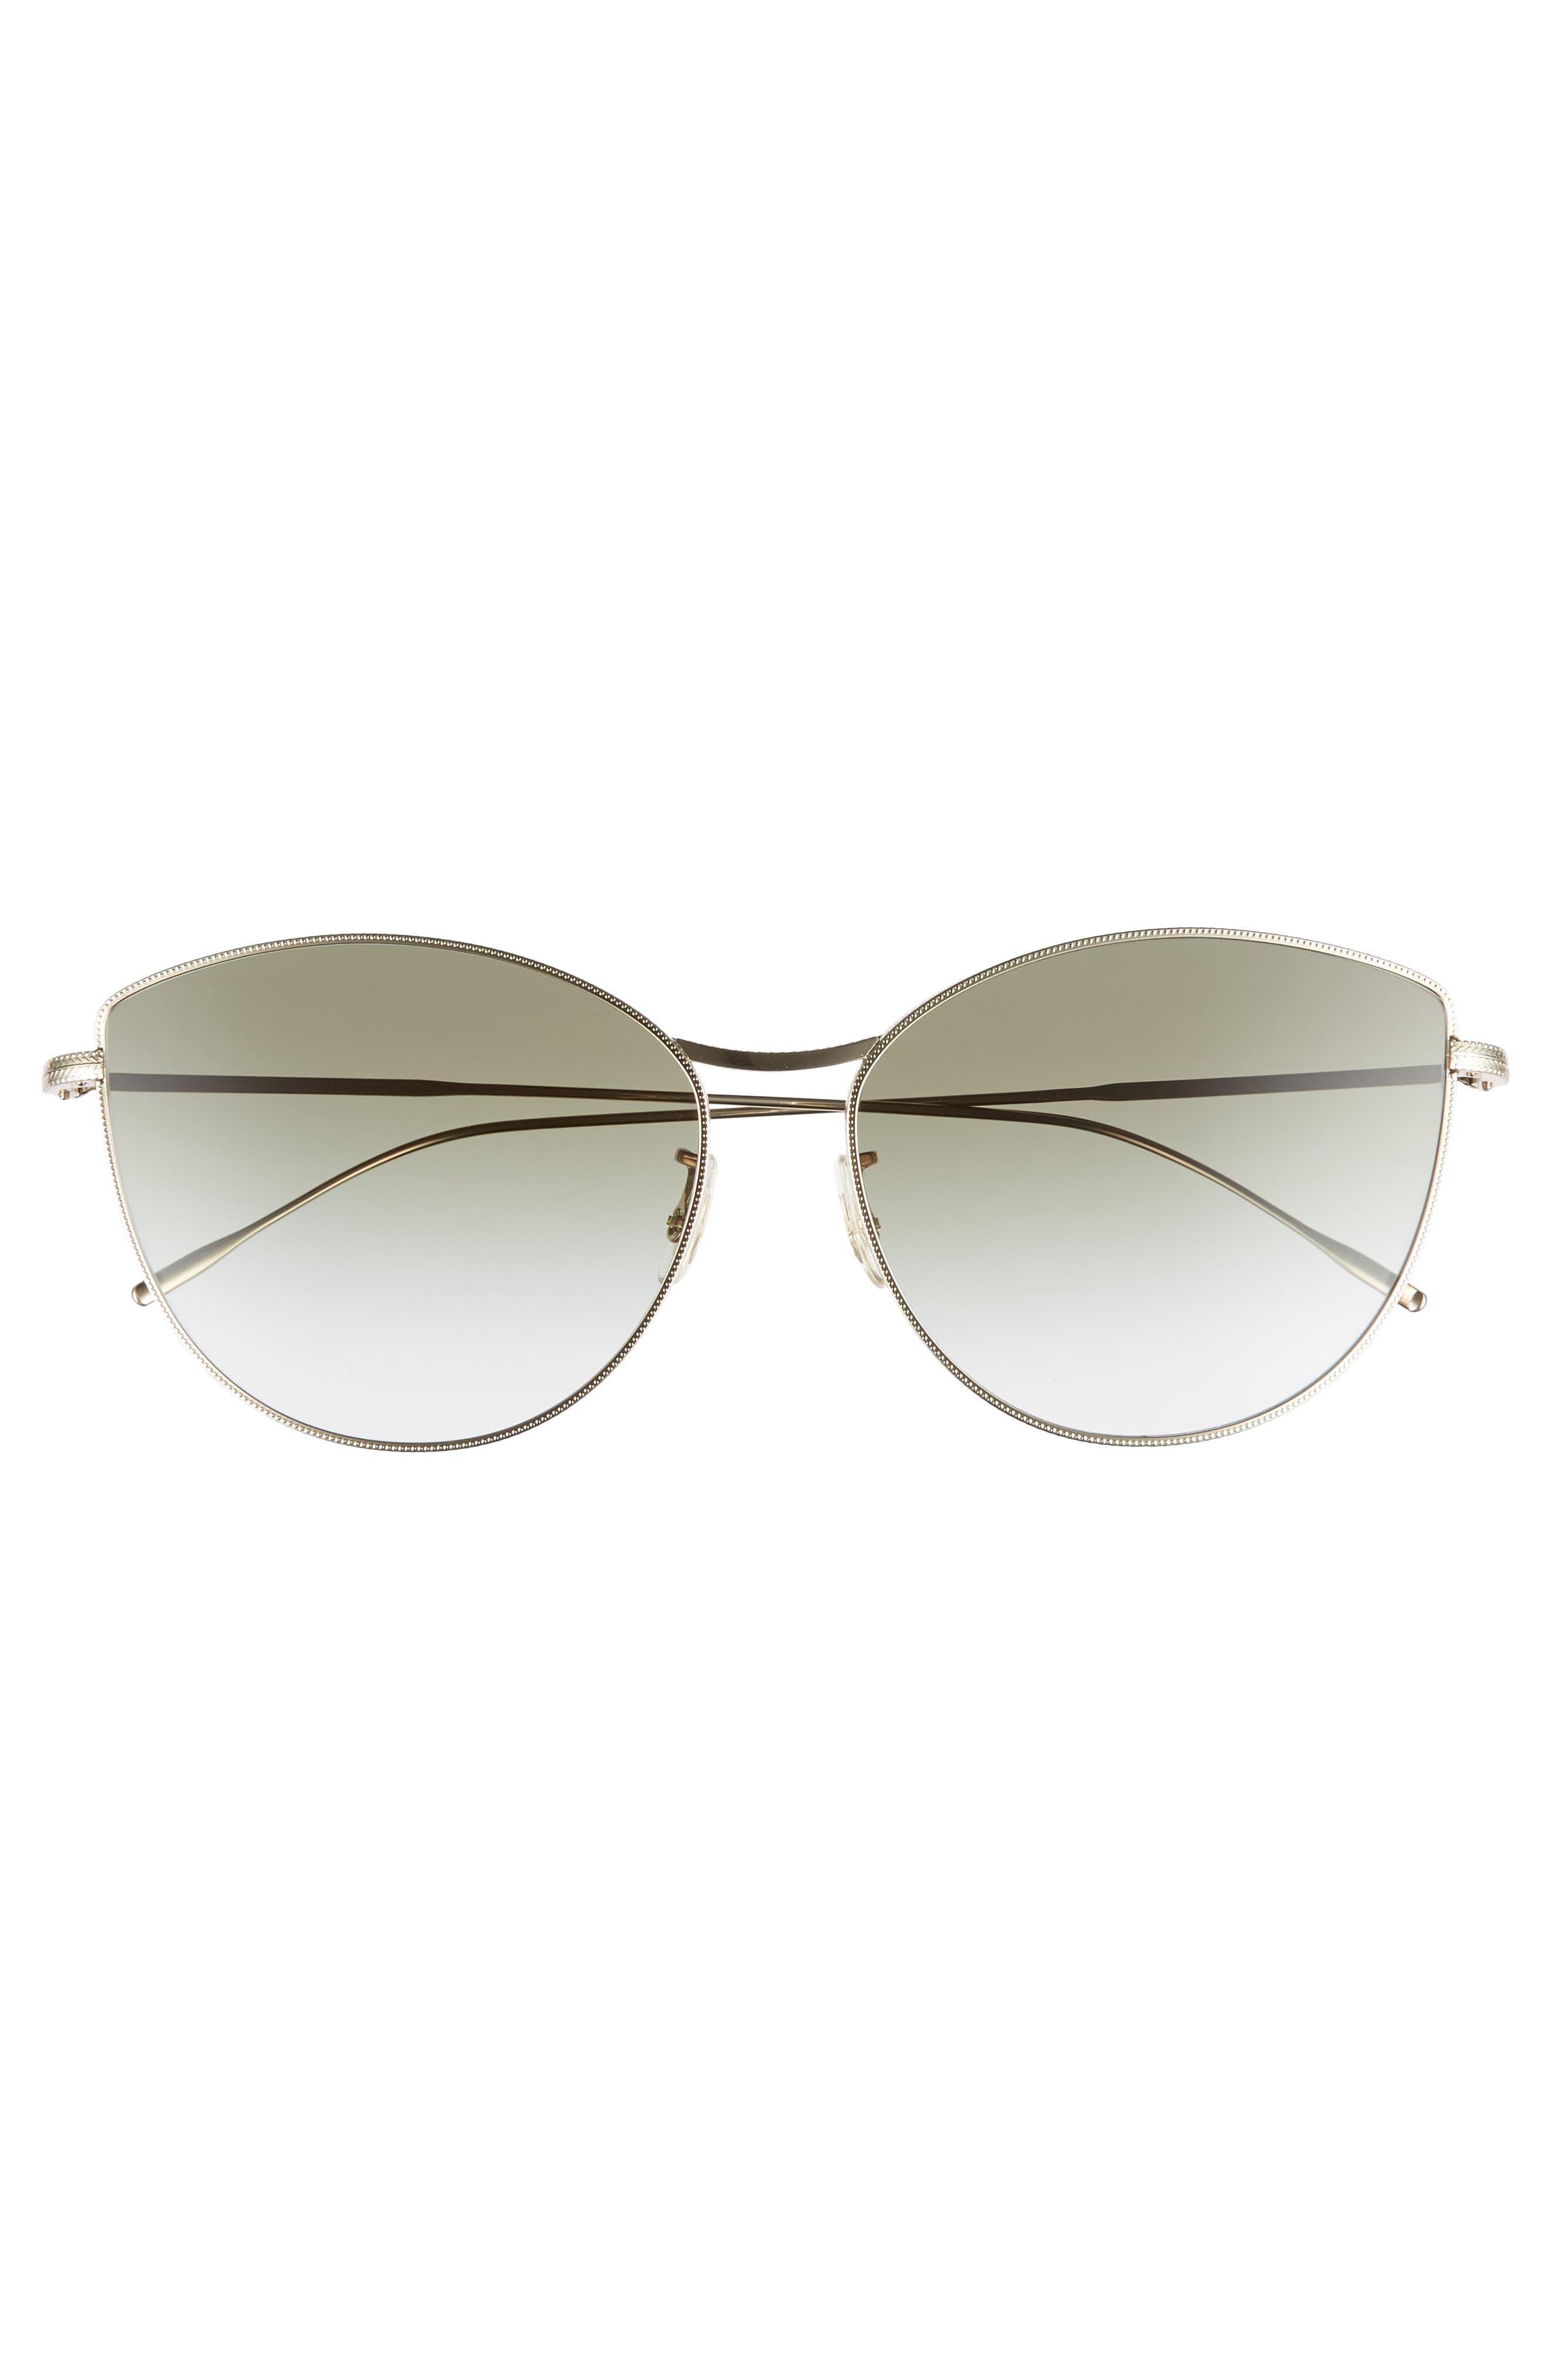 Rayette 60mm Cat Eye Sunglasses,                             Alternate thumbnail 3, color,                             SOFT GOLD OLIVE